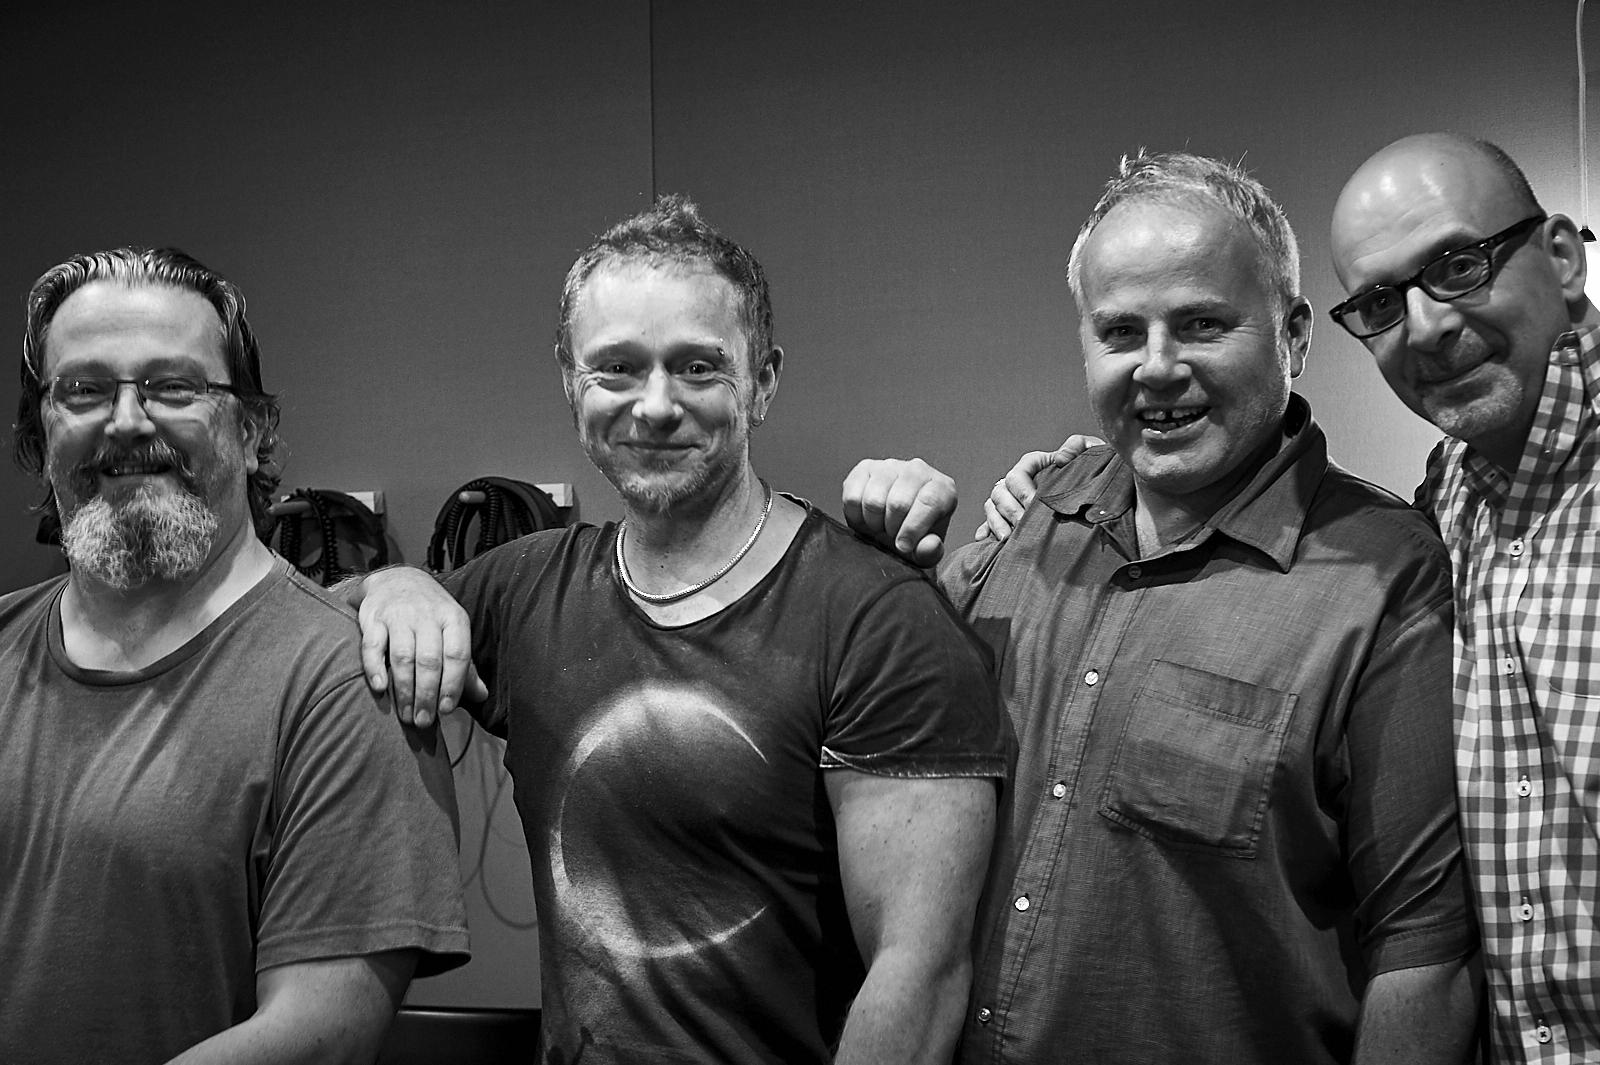 Recording at Pughouse Studios, January 2017 Niko Schauble, Kim May, Mark Fitzgibbon, Me